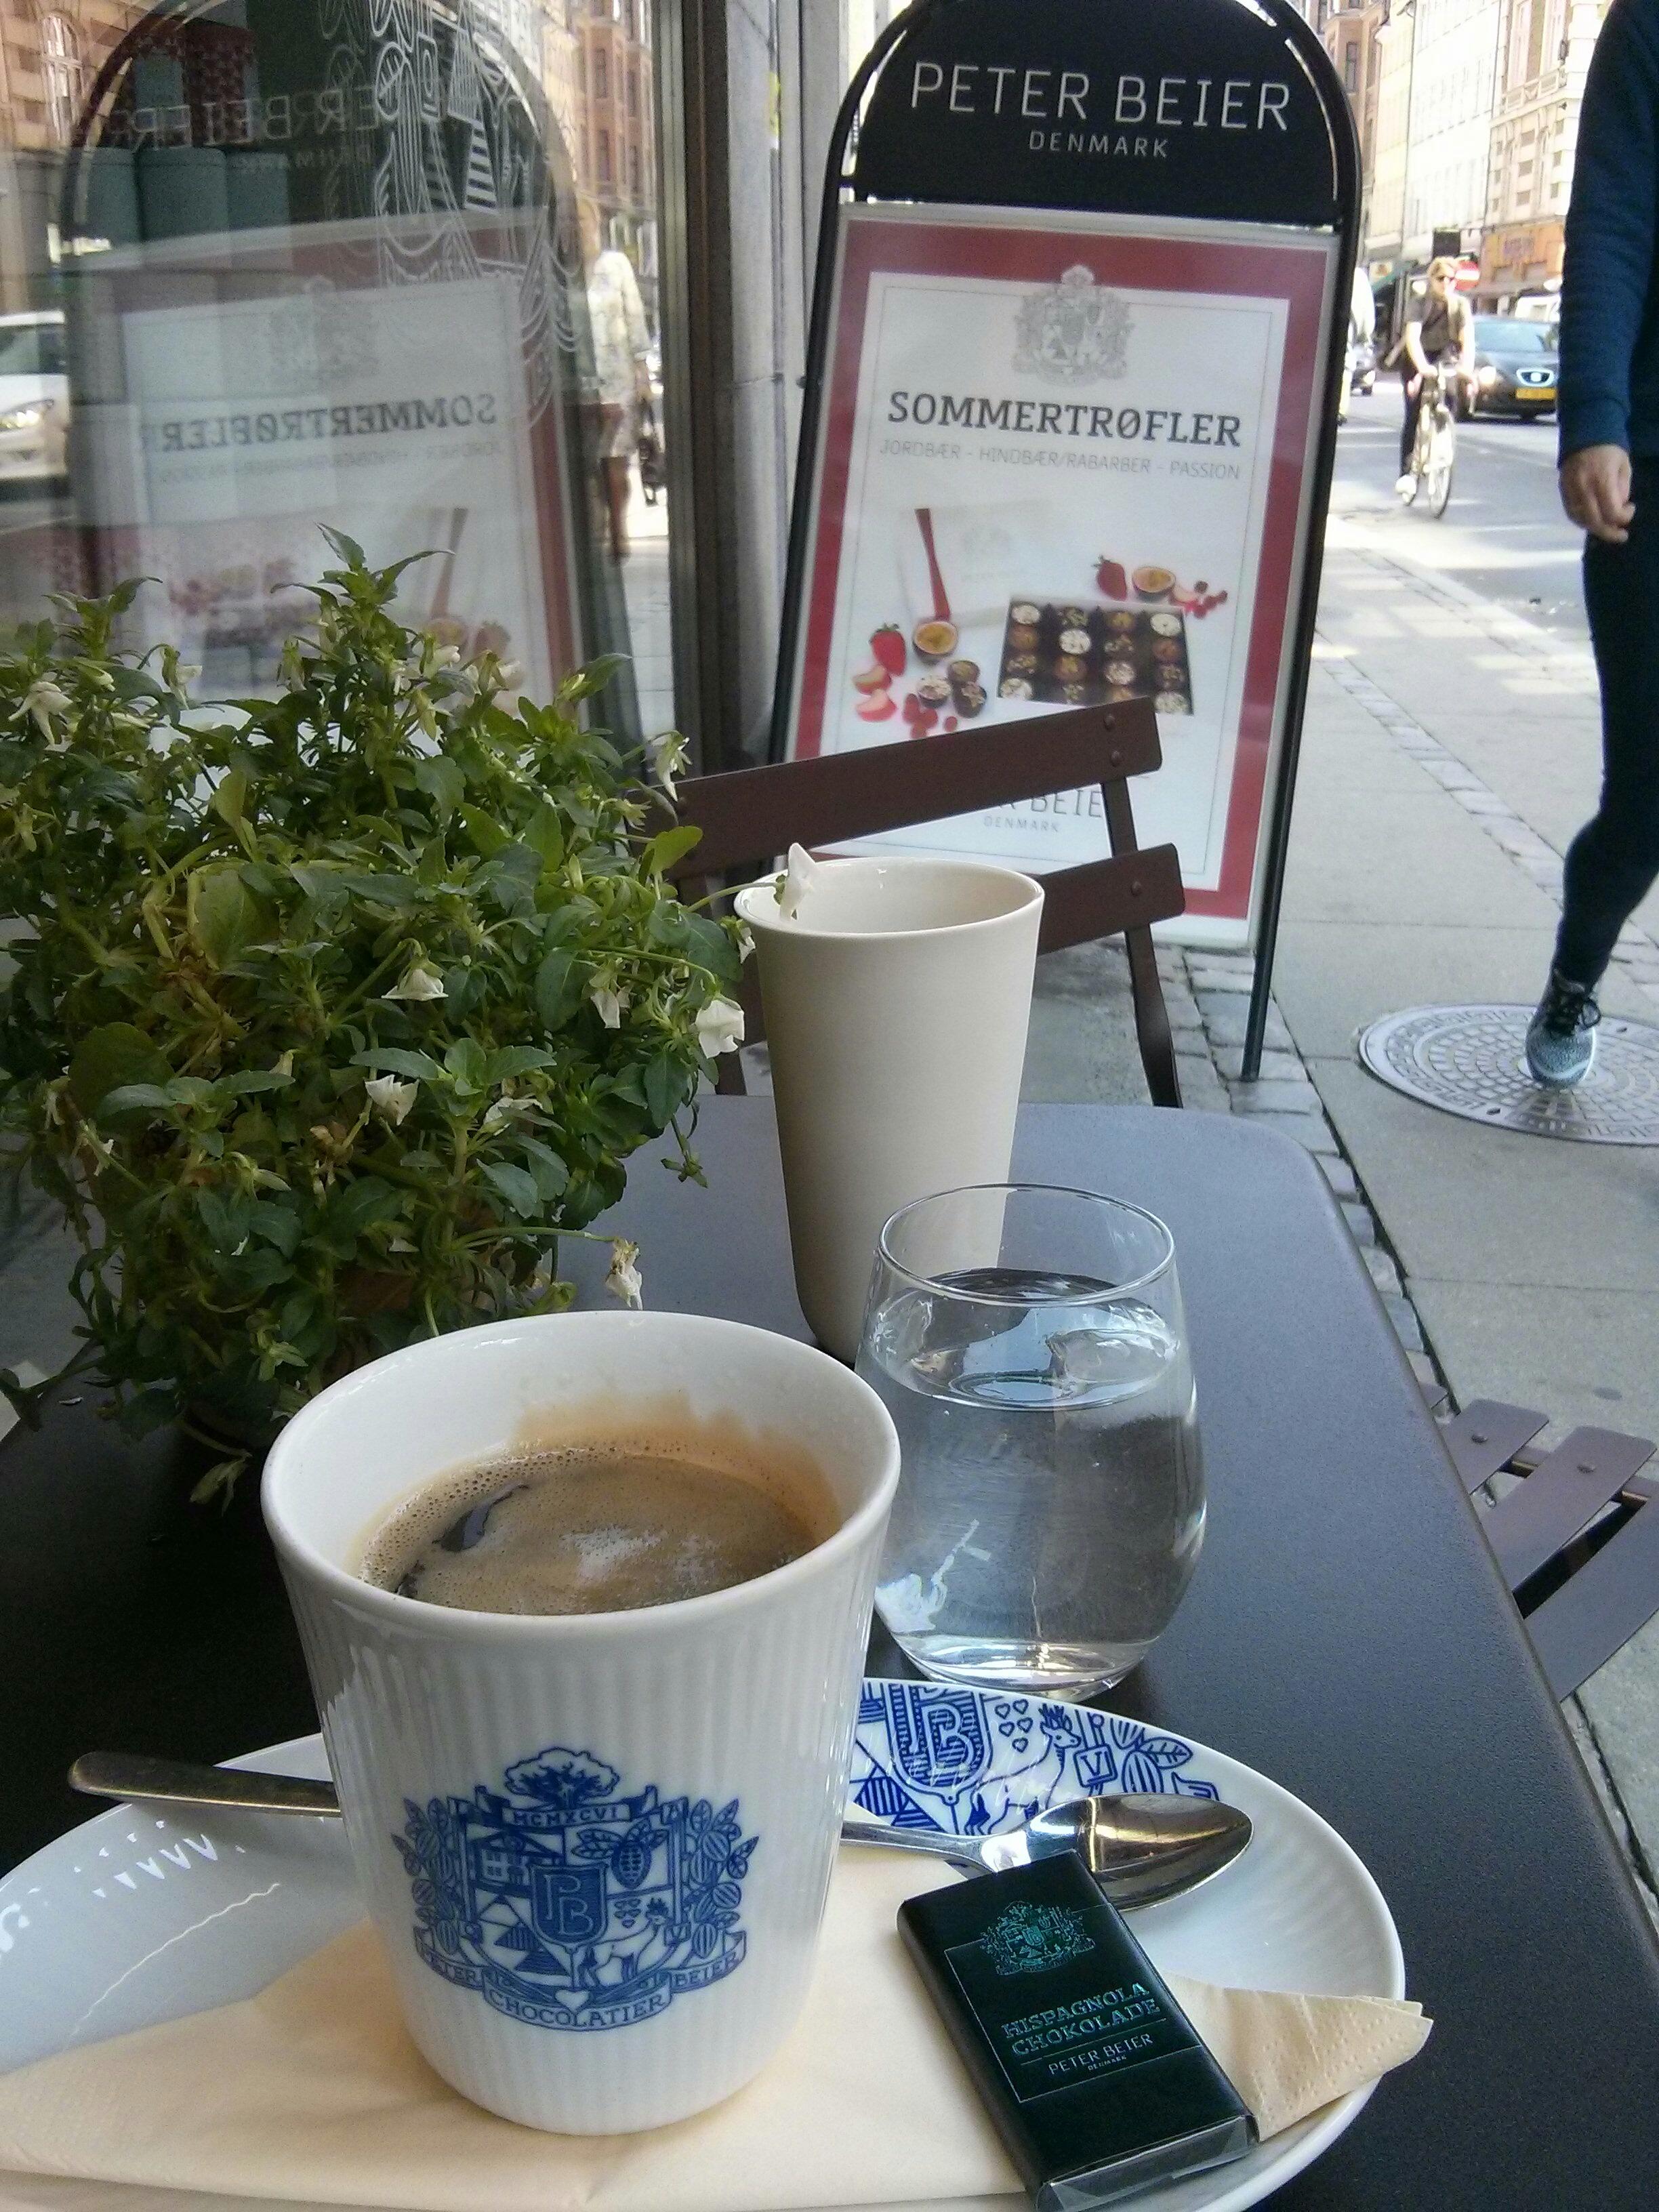 coffee, store kongensgade ( http://www.pbchokolade.dk/gb/ )and watching the interesting crow walking by.